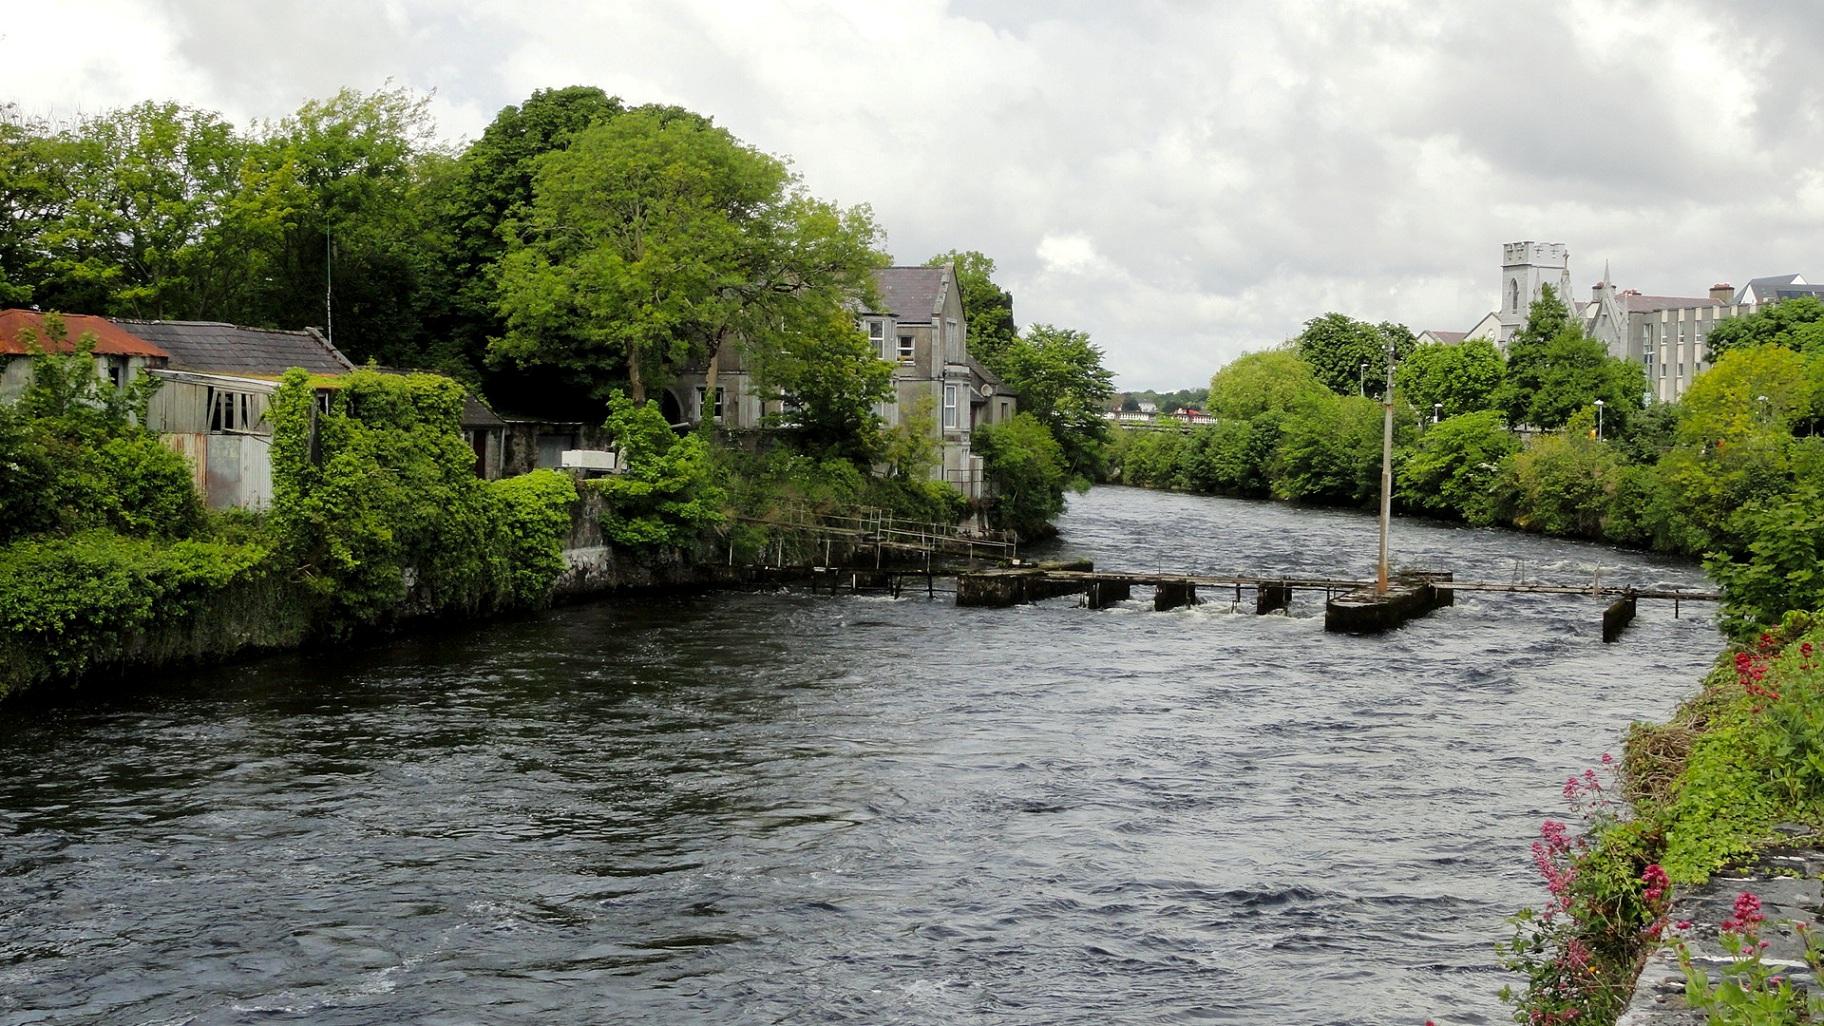 Galway - Le long de River Corrib